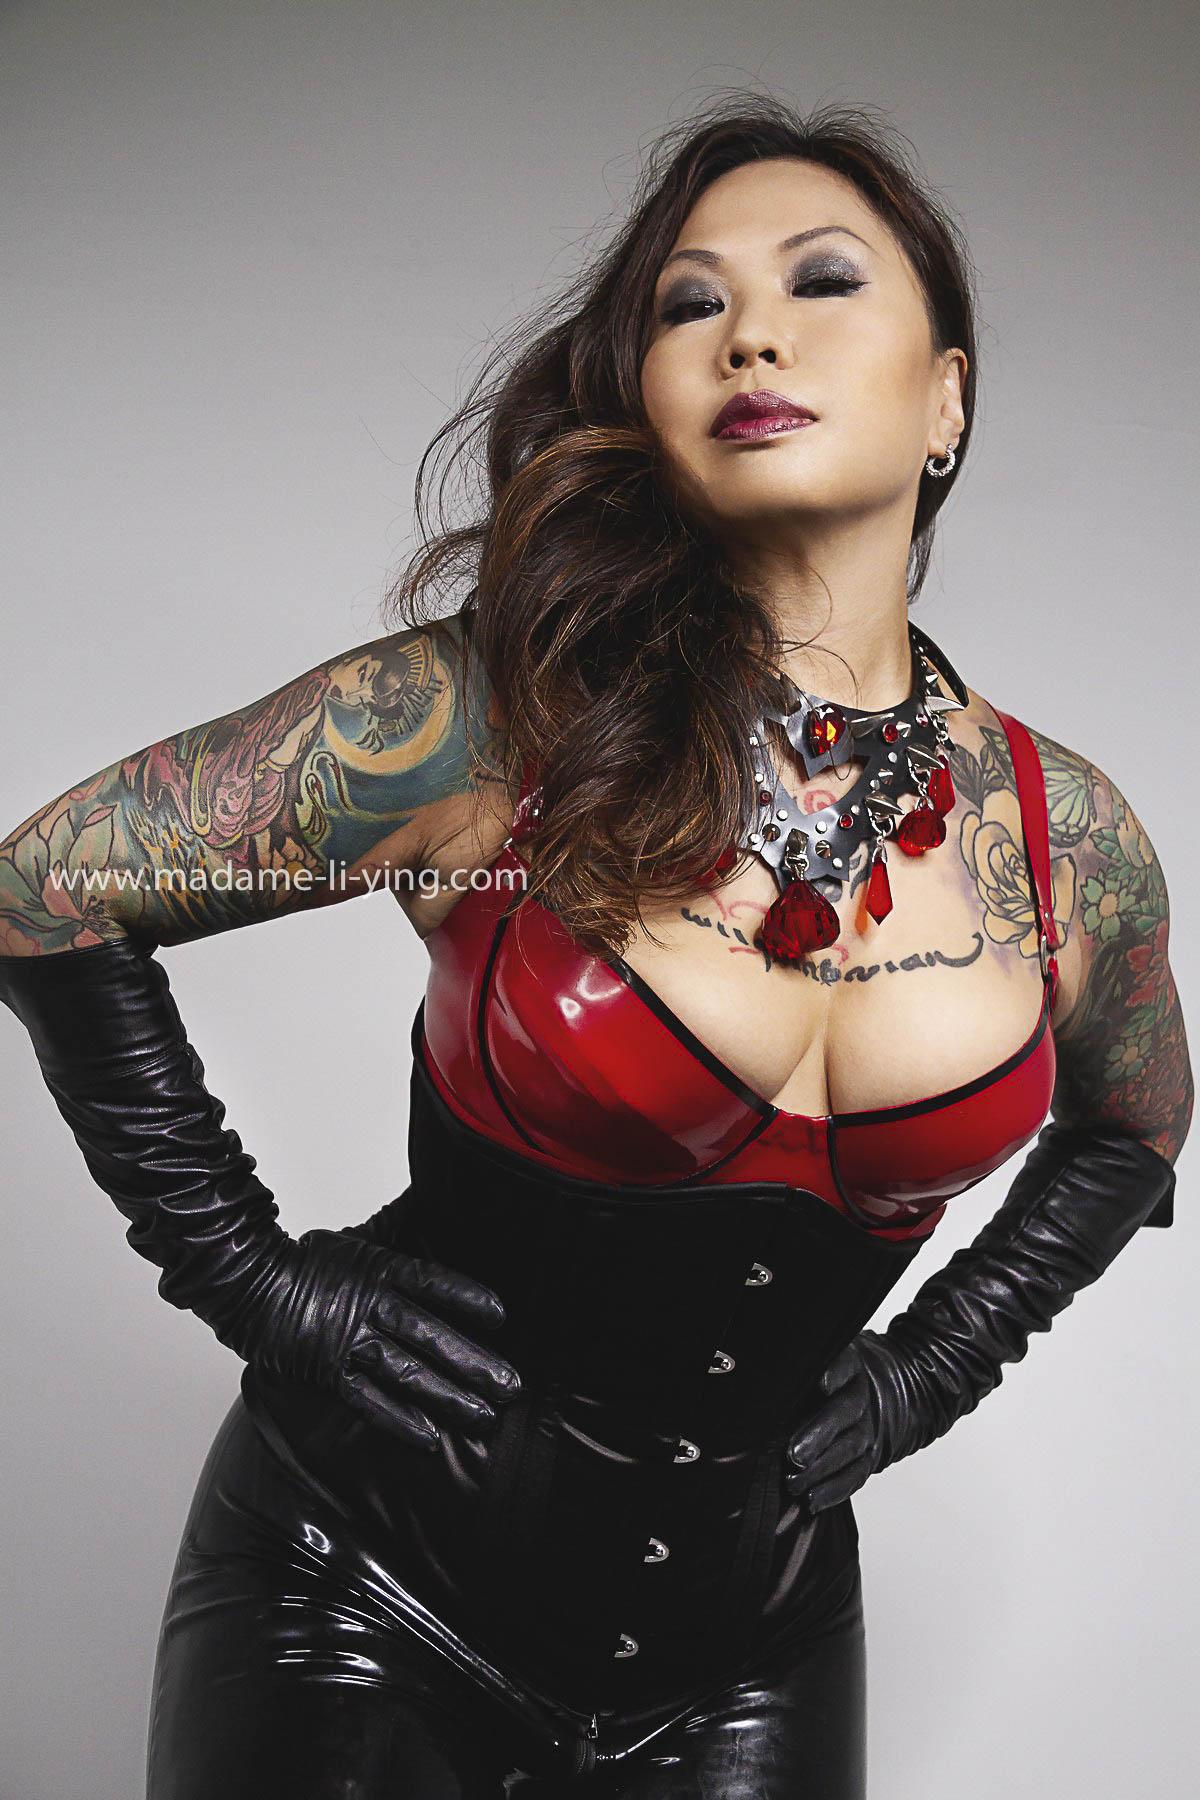 Medical-Fetish-Mistress-Madame-Li-Ying - London Mistress -4324